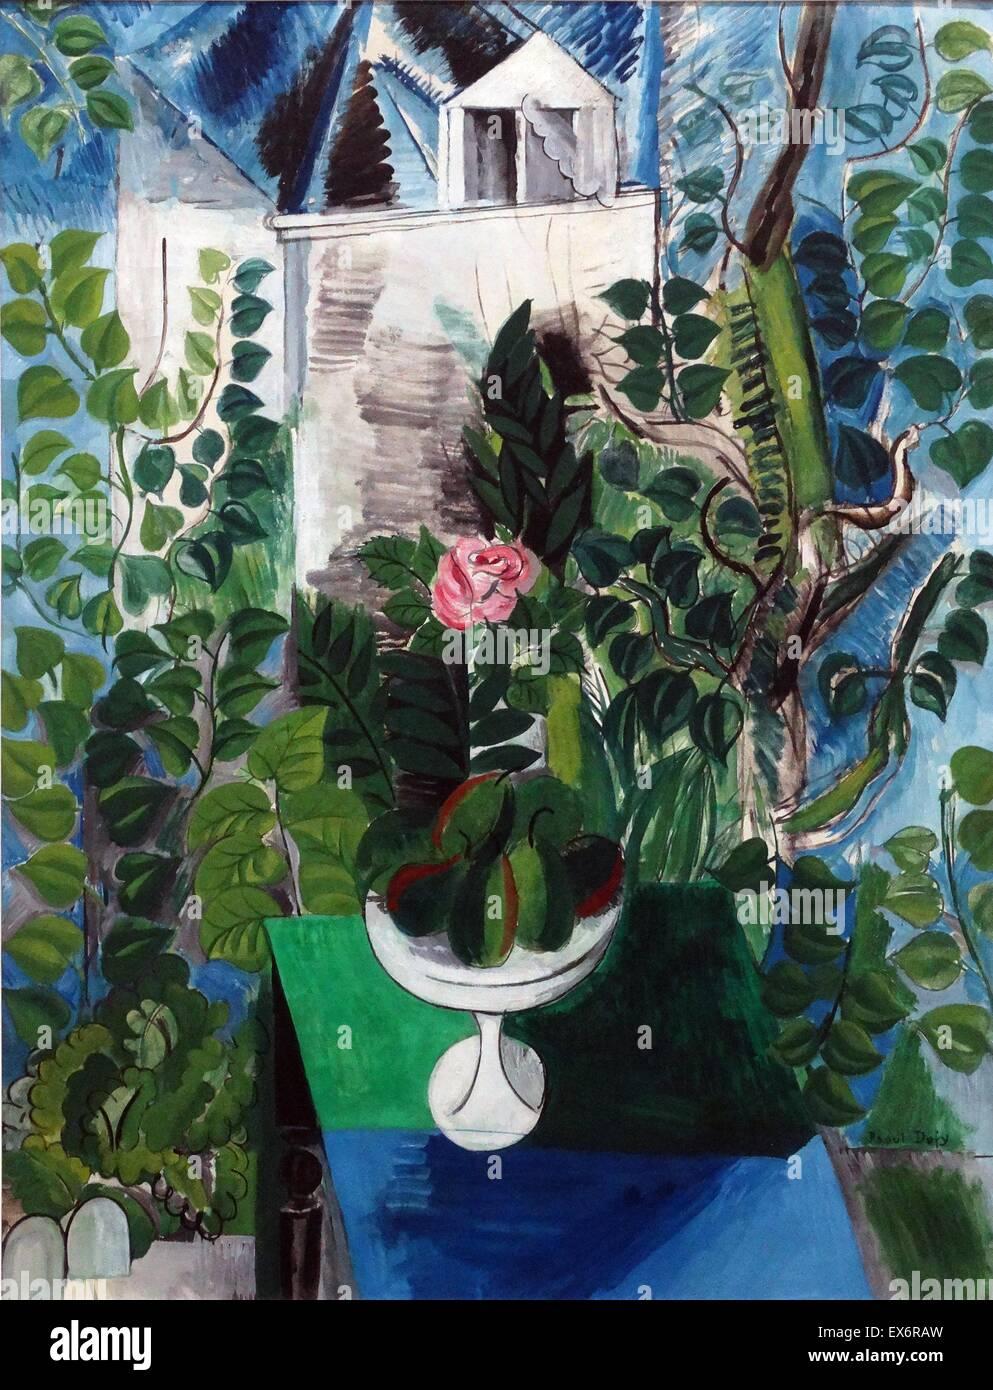 Maison et Jardin von Raoul Dufy (1877-1953). Öl auf Leinwand, 1915 ...